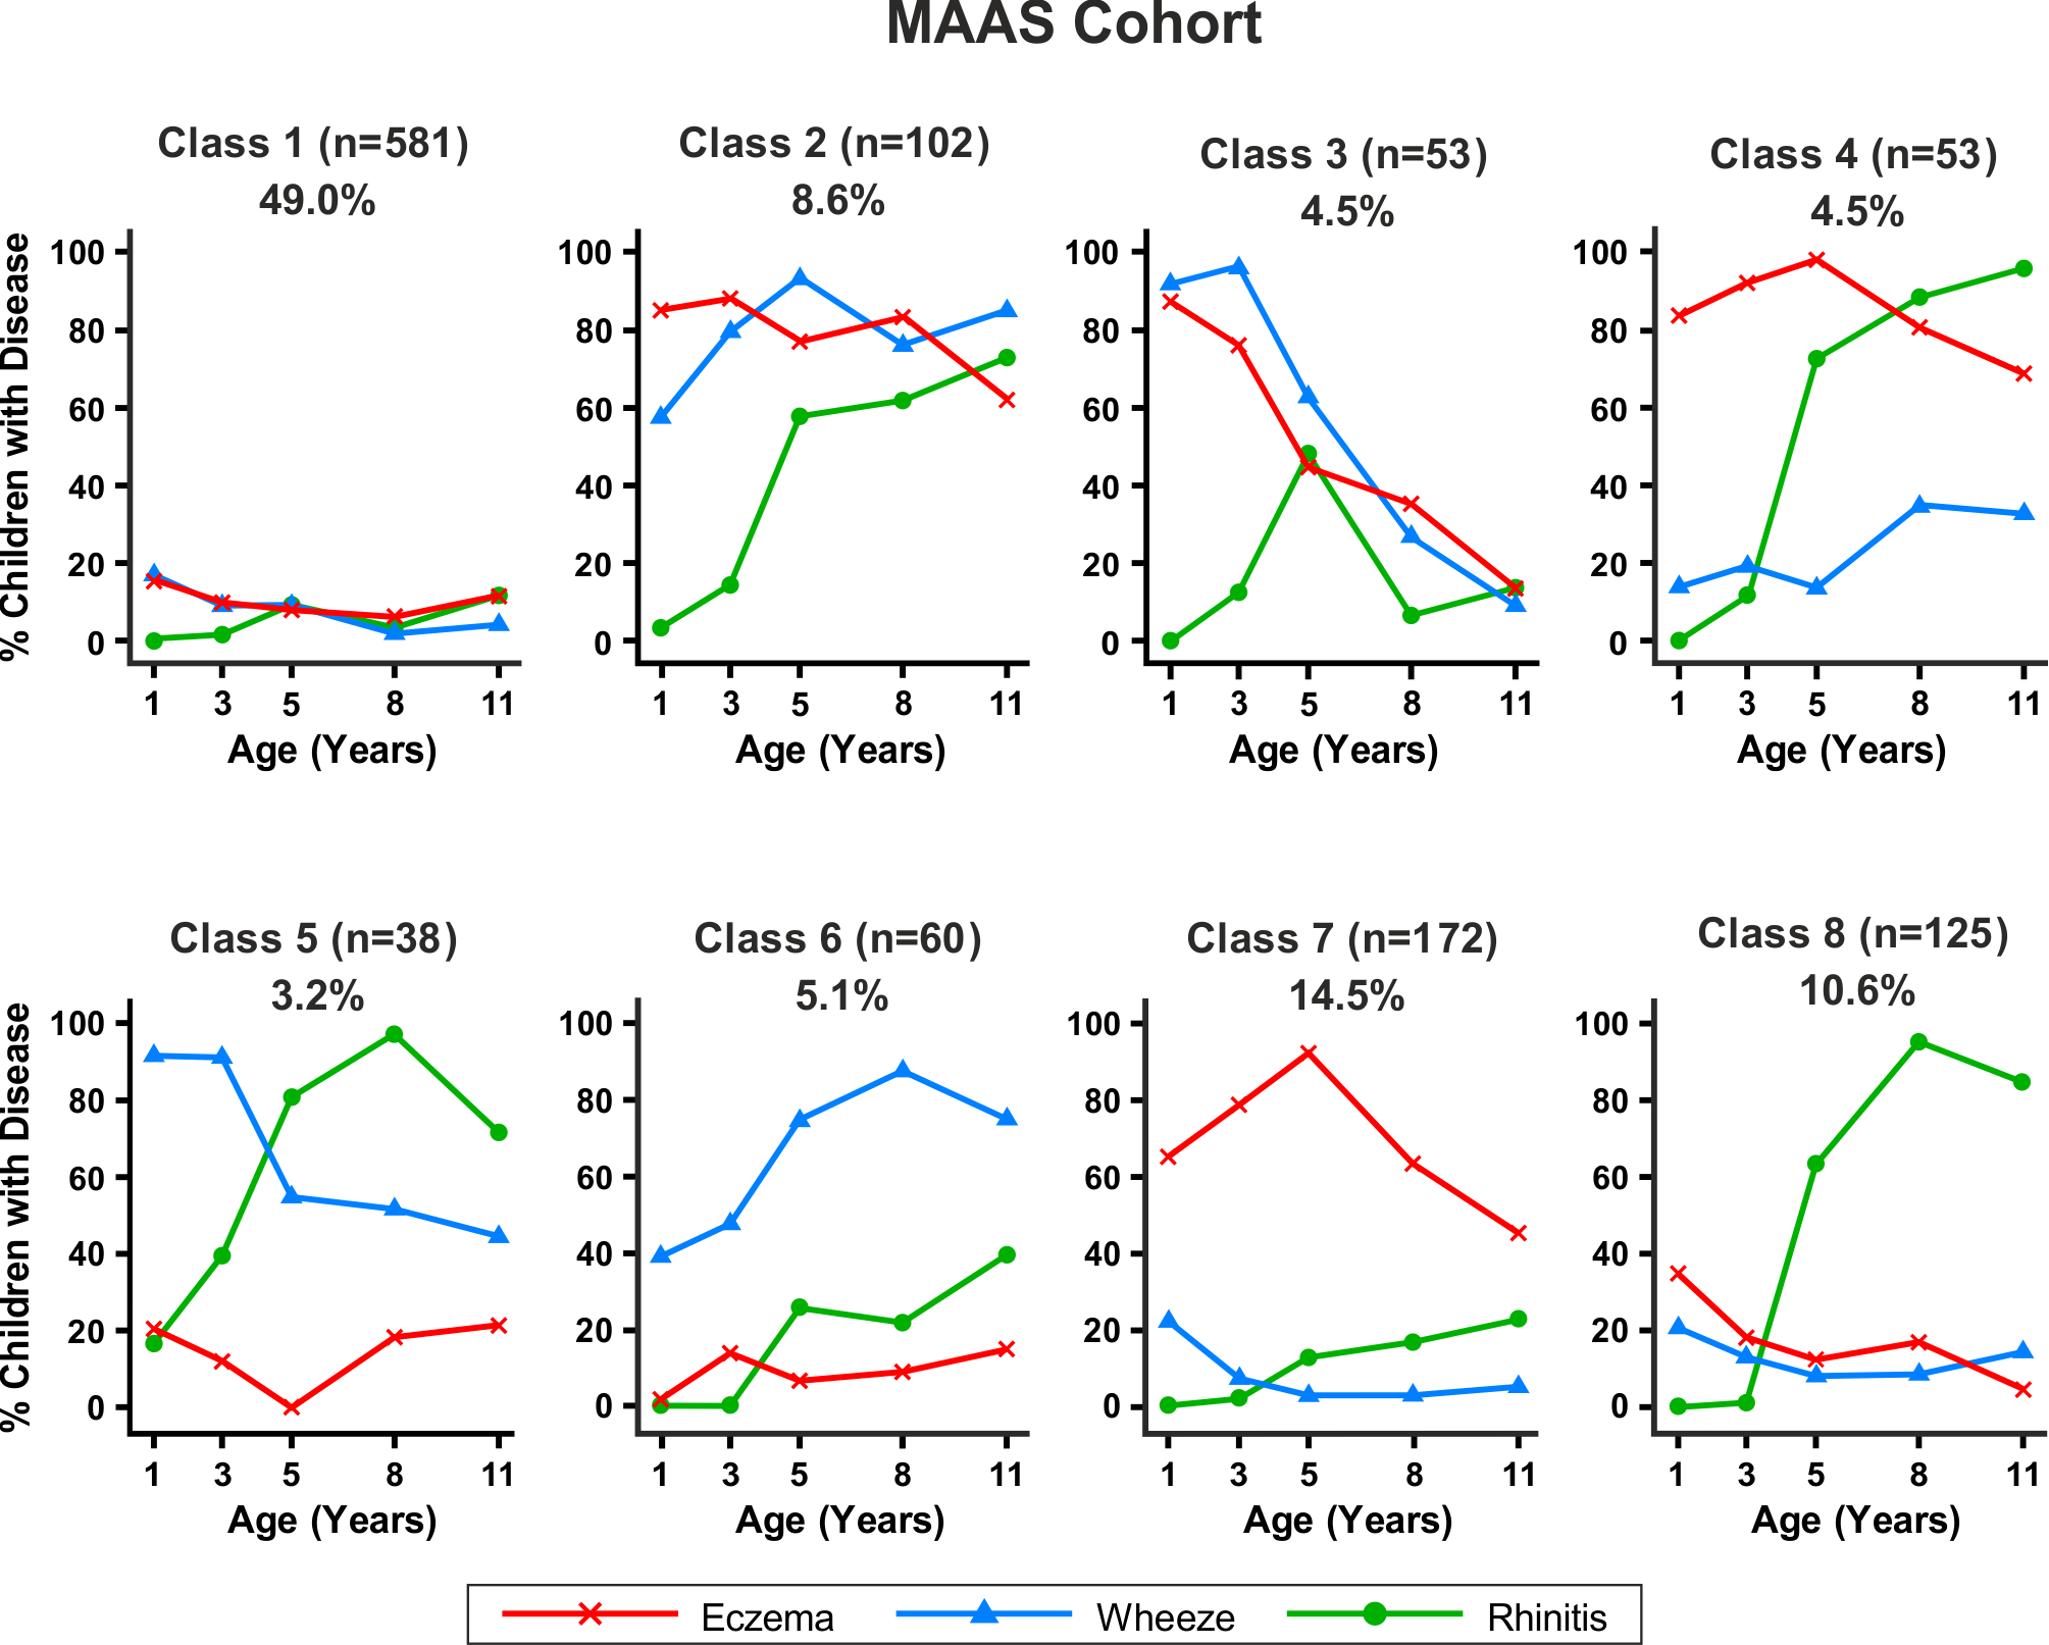 Distinct disease profile classes in MAAS.